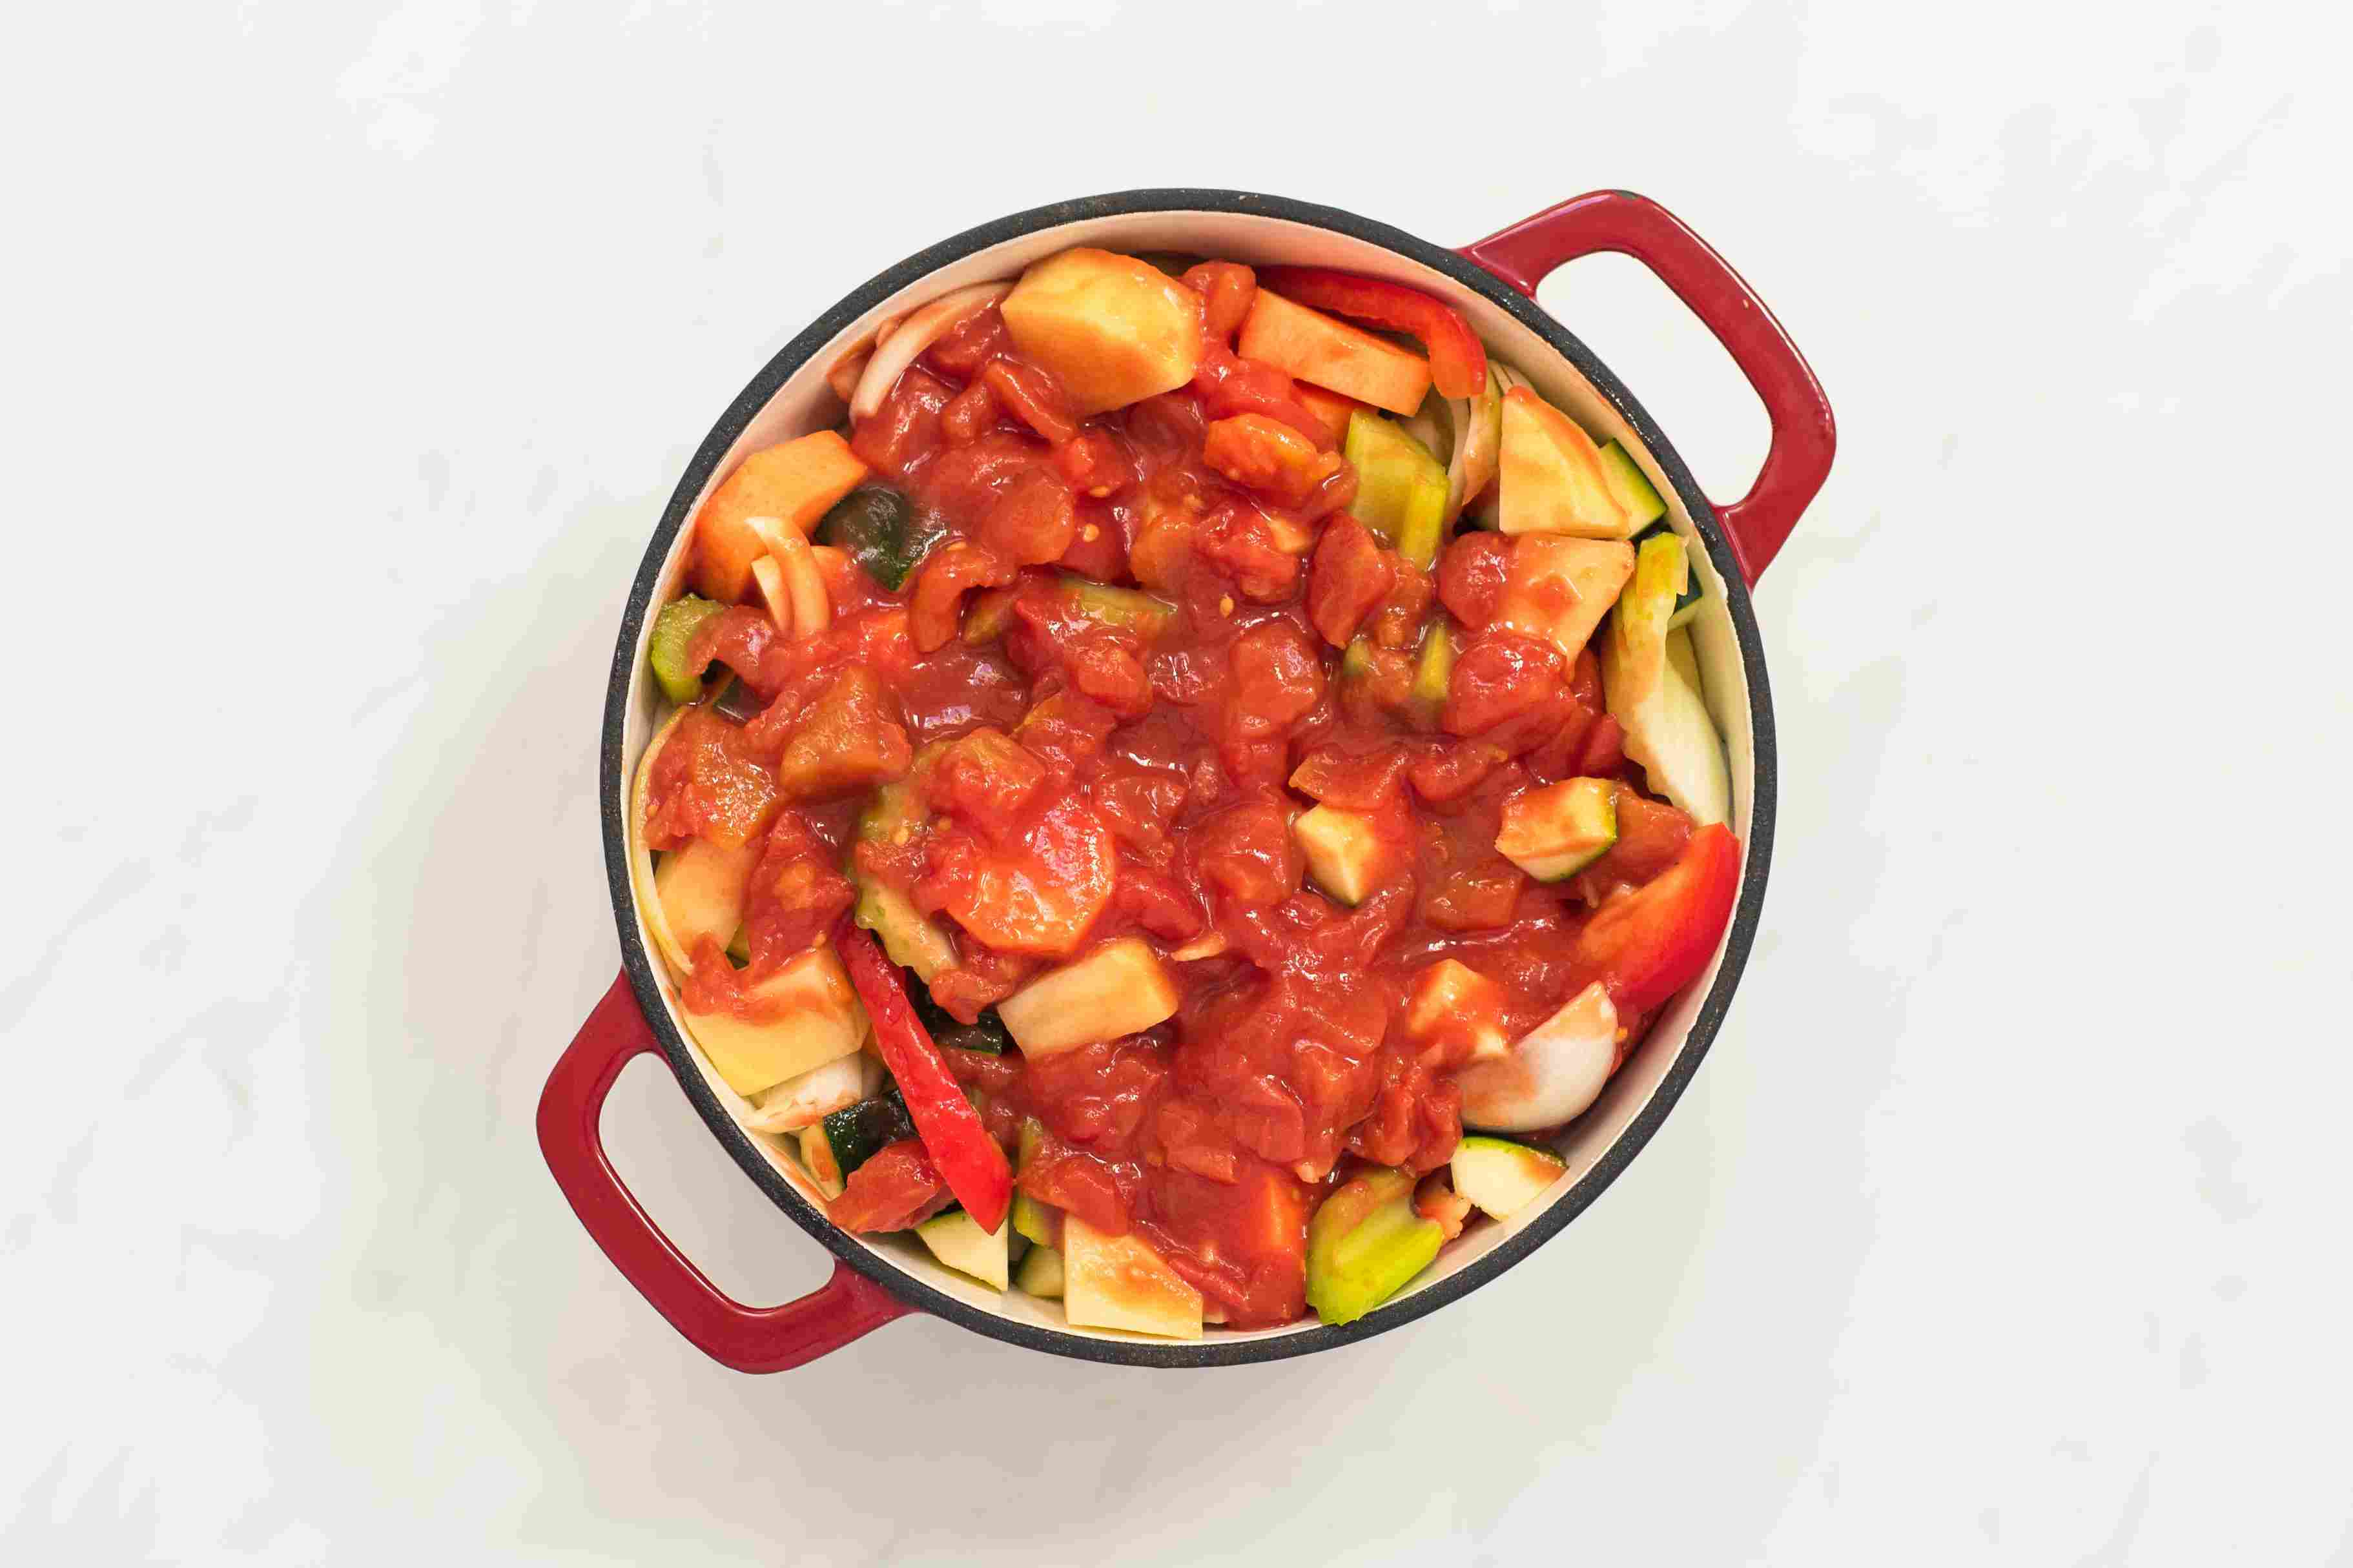 Add tomatoes and tomato liquid to pot